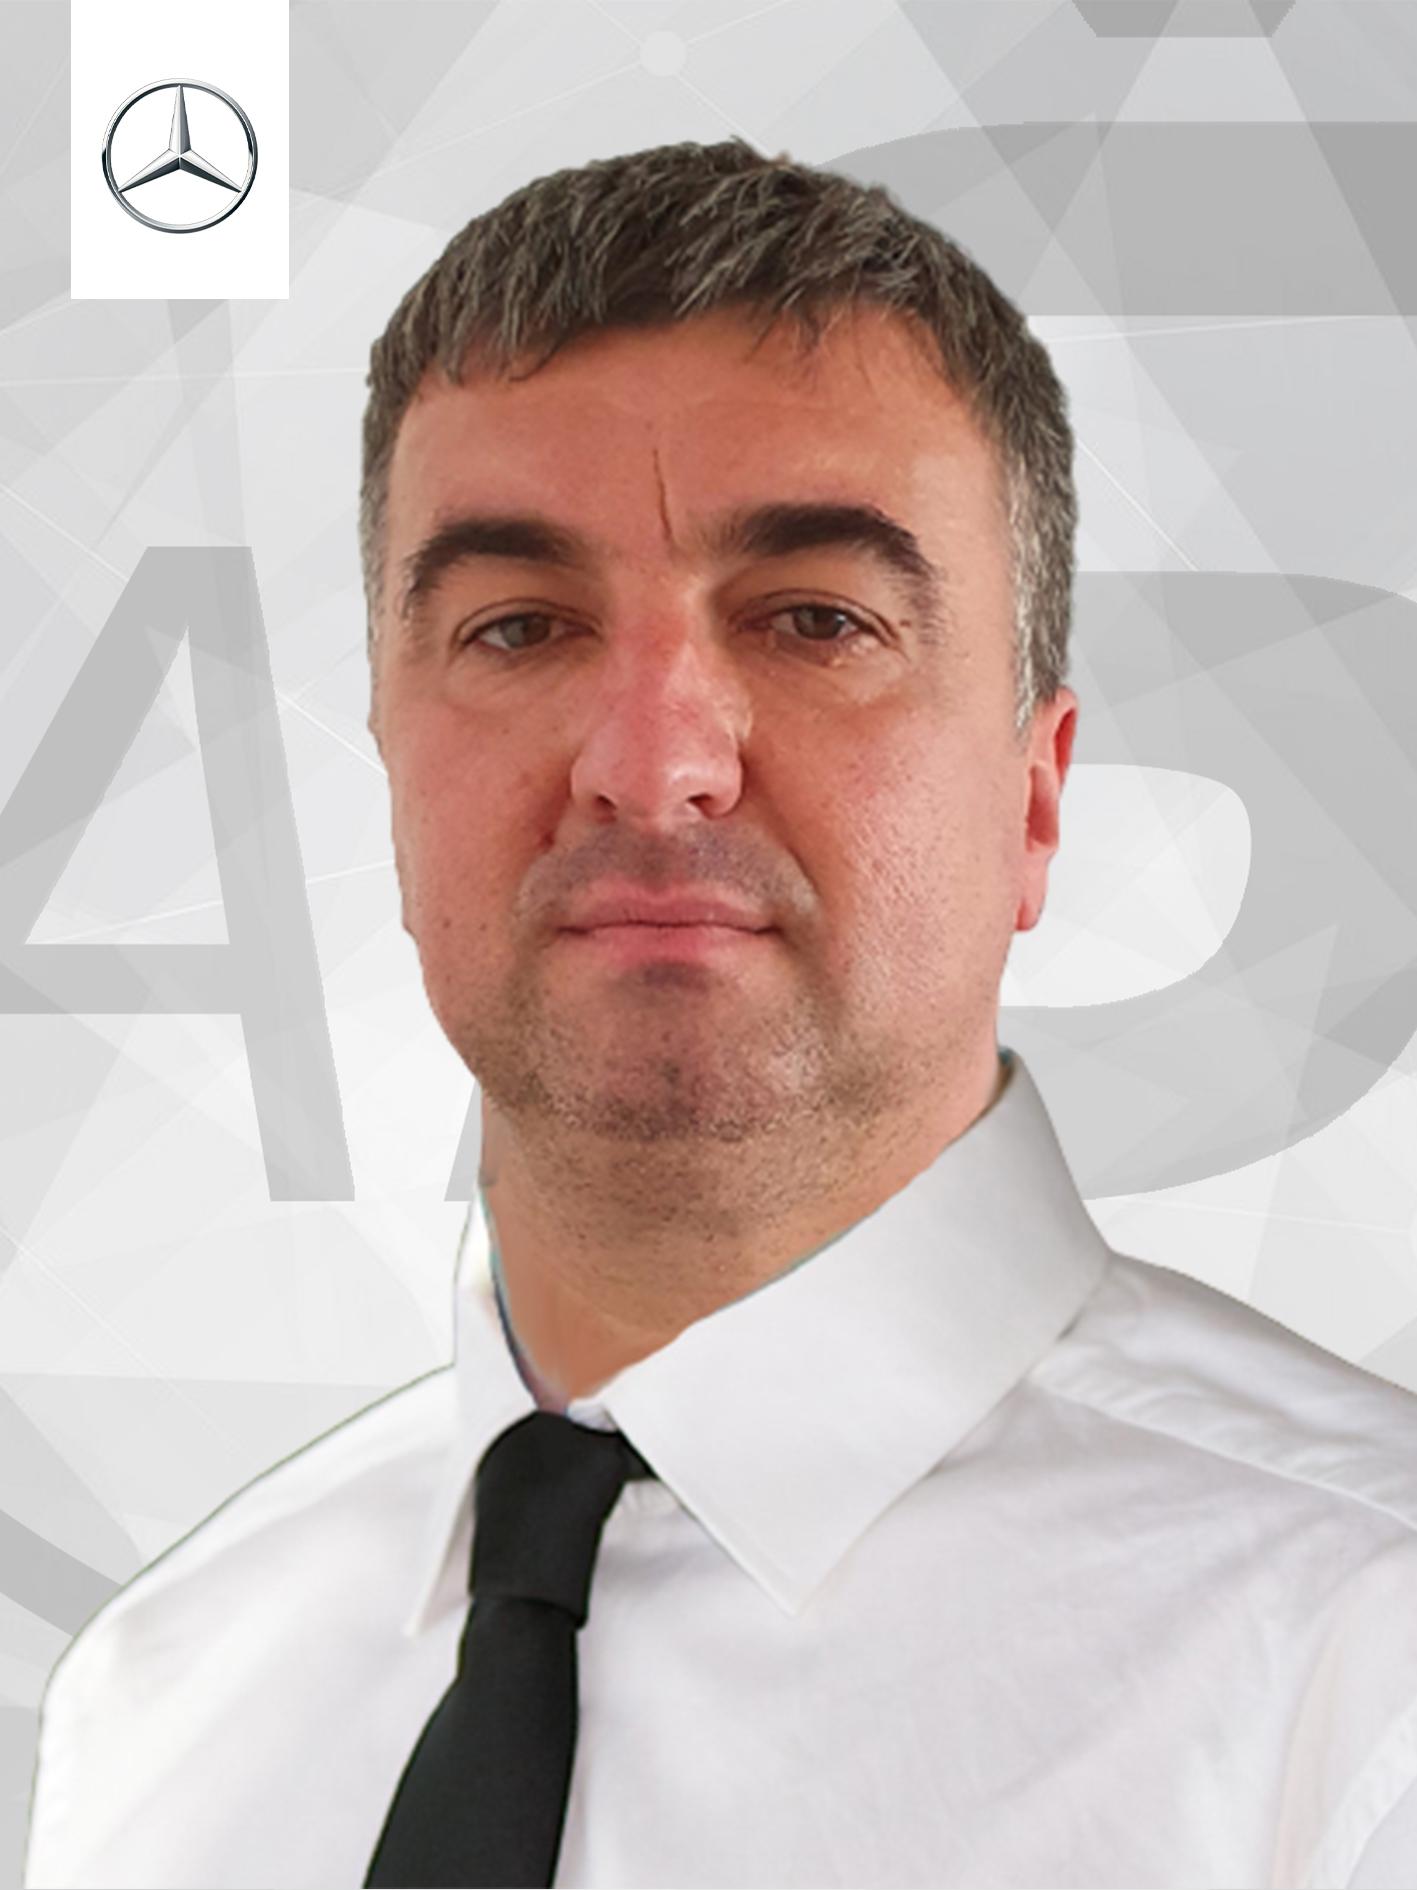 Krunoslav Mikola